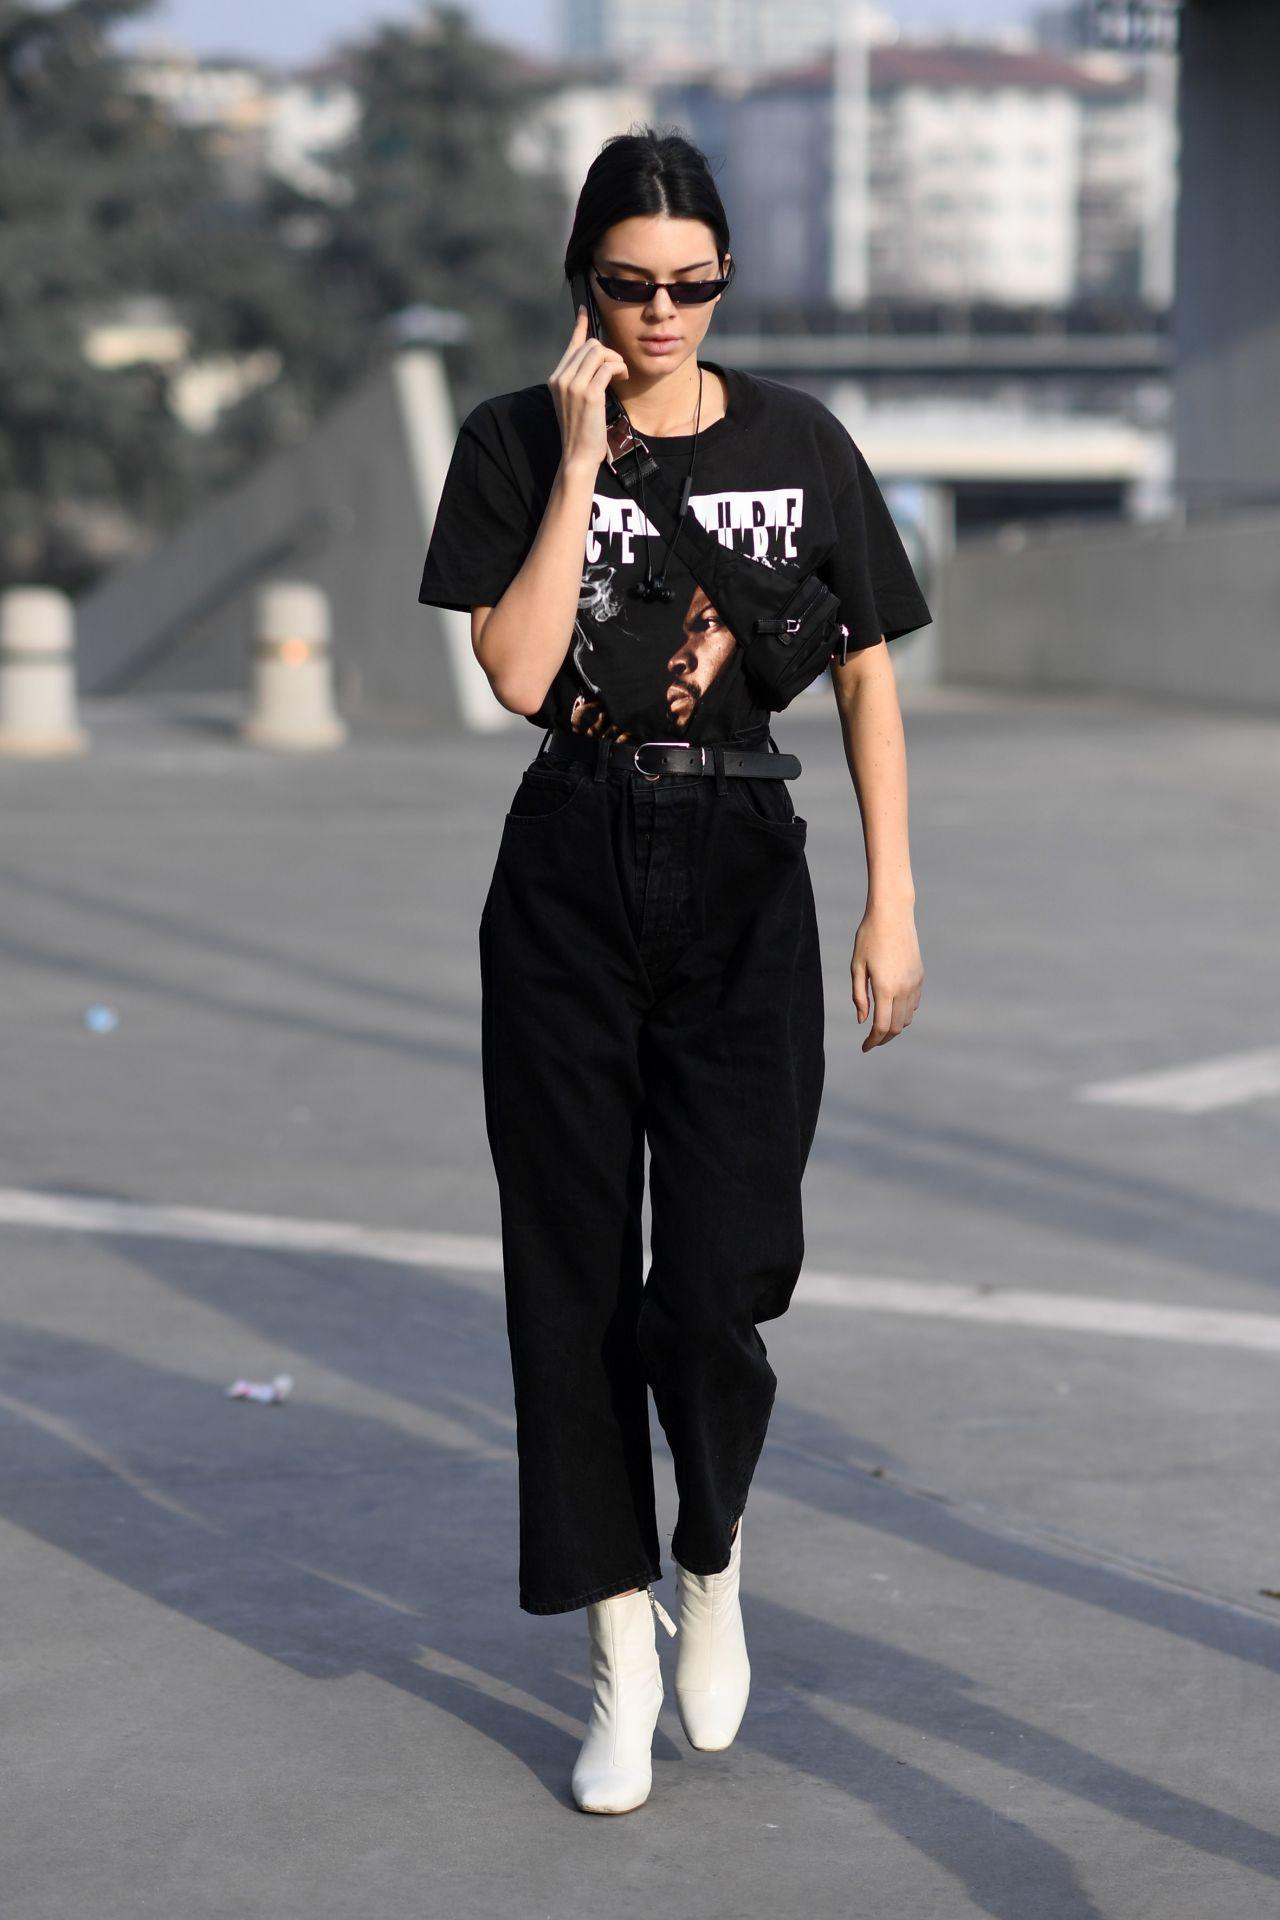 Kendall Jenner At Milan Fashion Week Arrives At Versace Show 2 24 2017